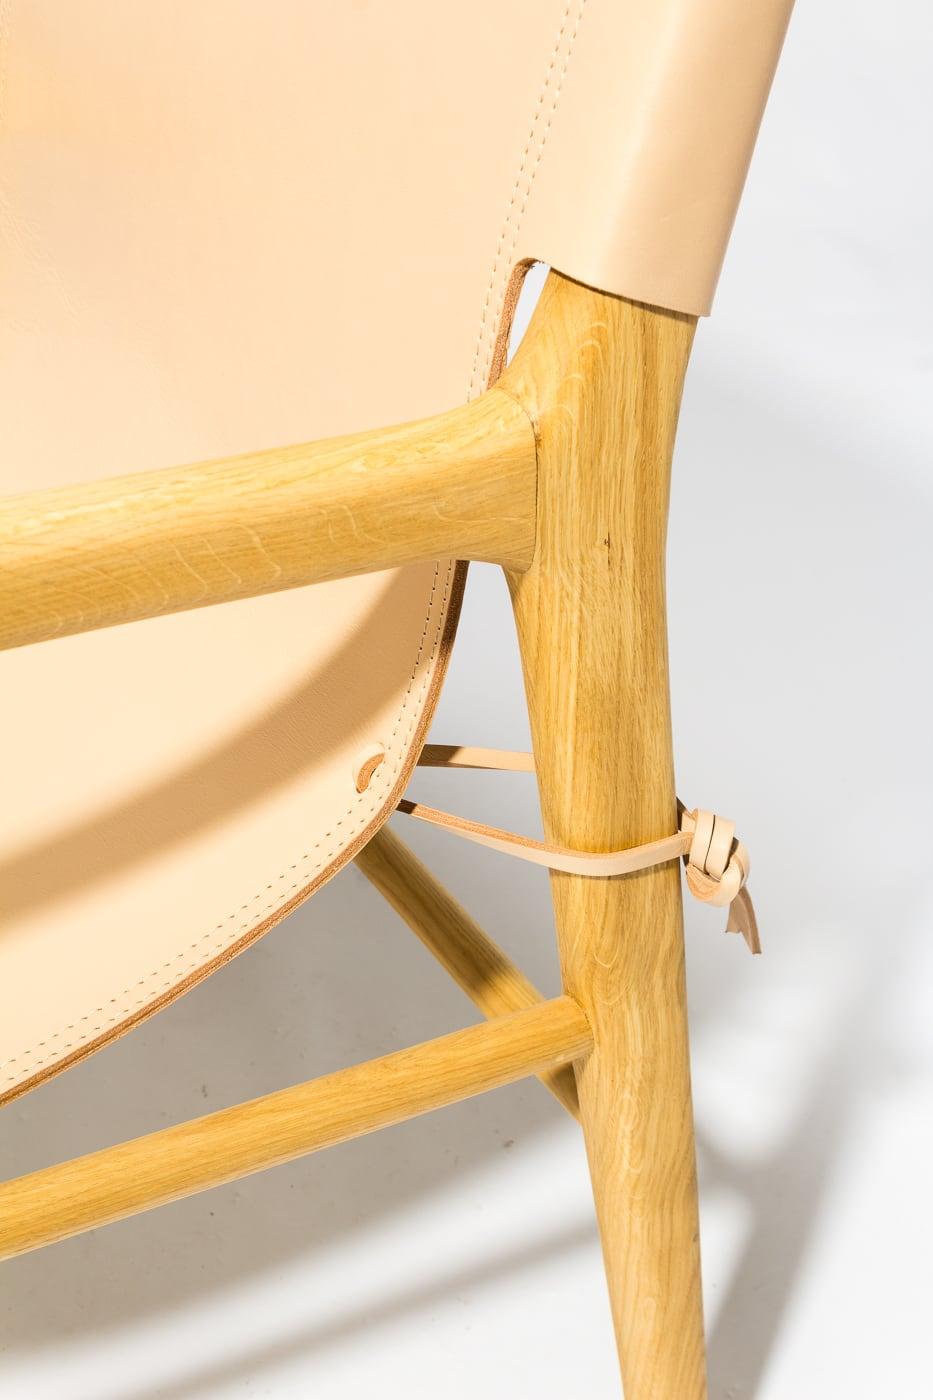 Fantastic Ch601 Cad Blush Leather Sling Safari Chair Prop Rental Cjindustries Chair Design For Home Cjindustriesco